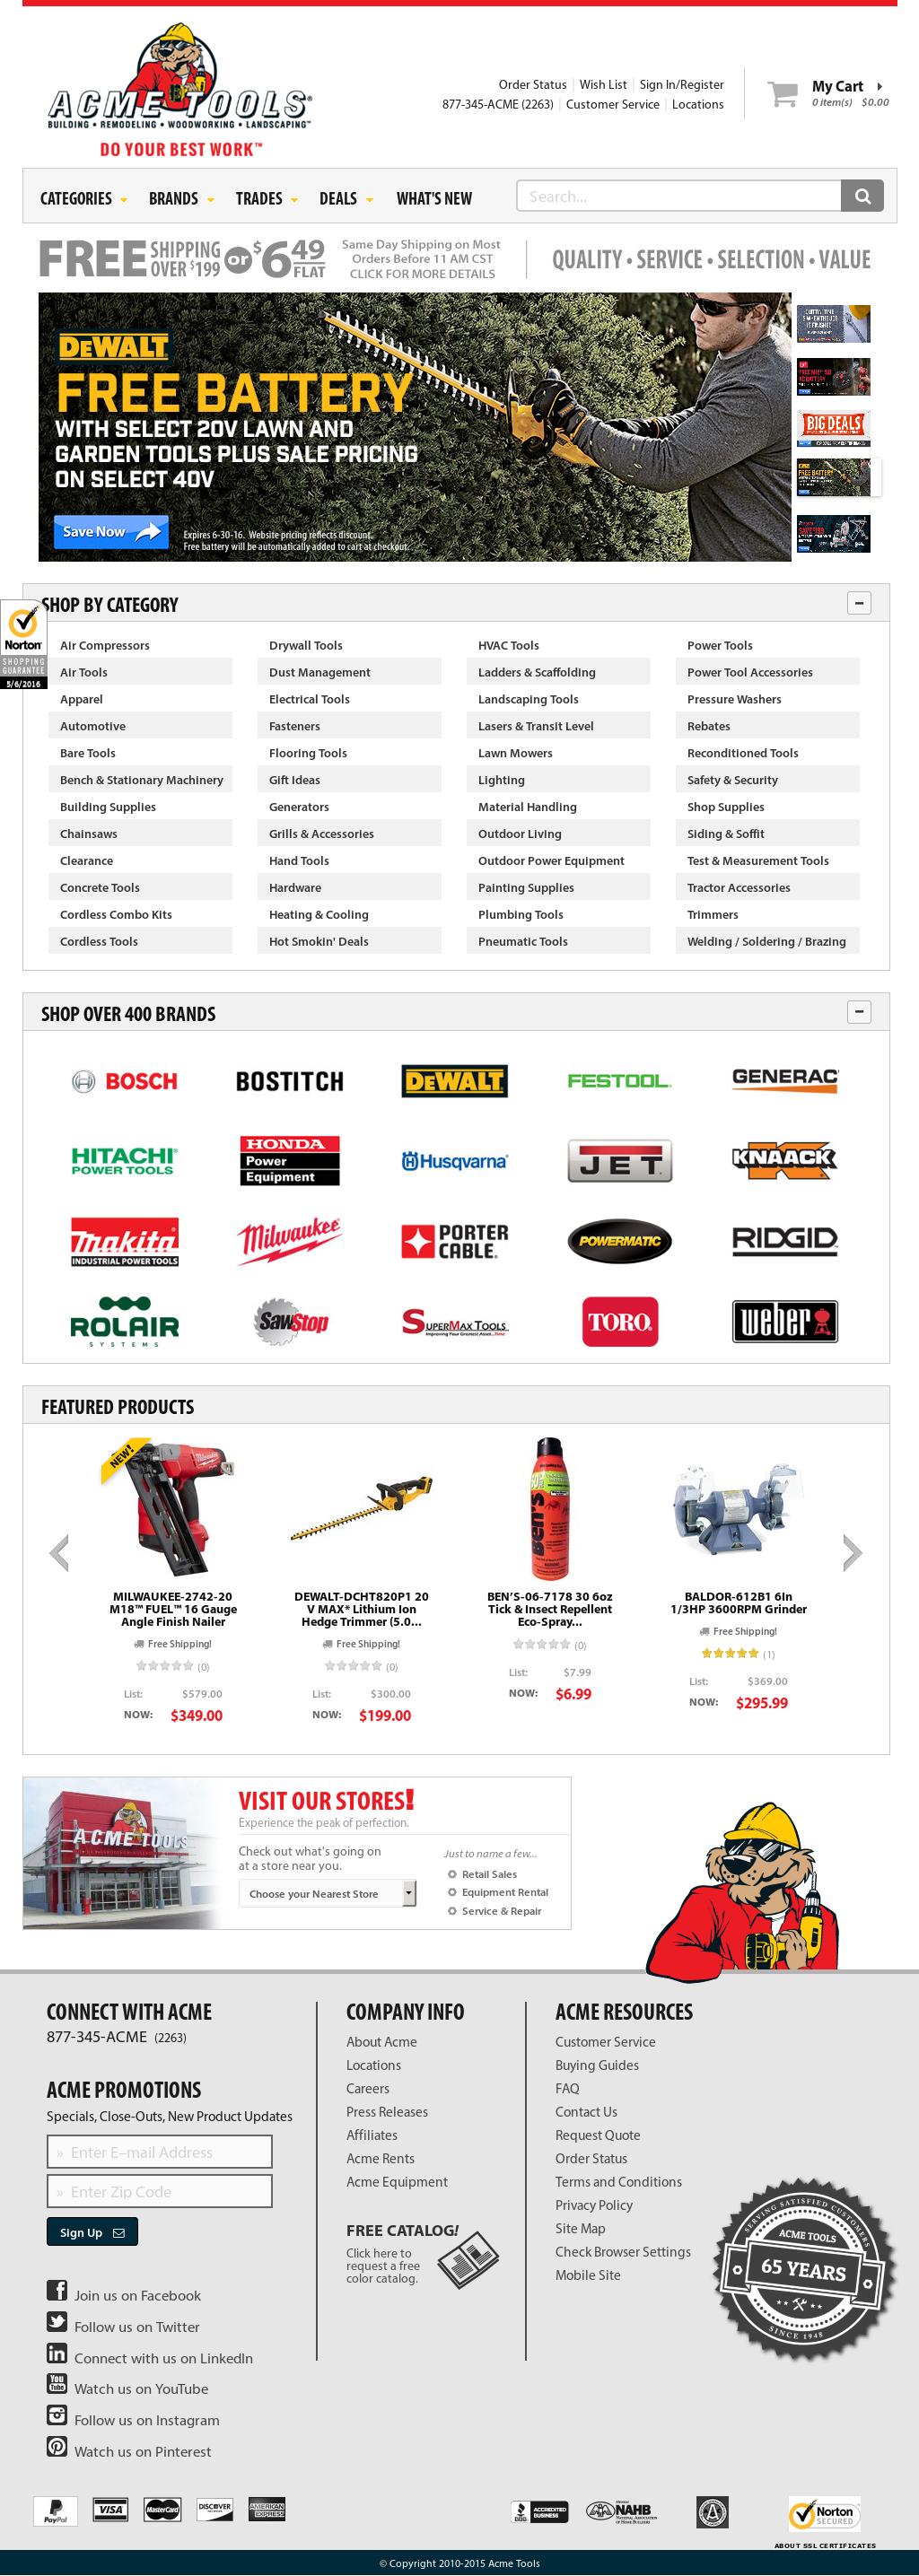 Owler Reports - Acme: Acme Tools Store Tour